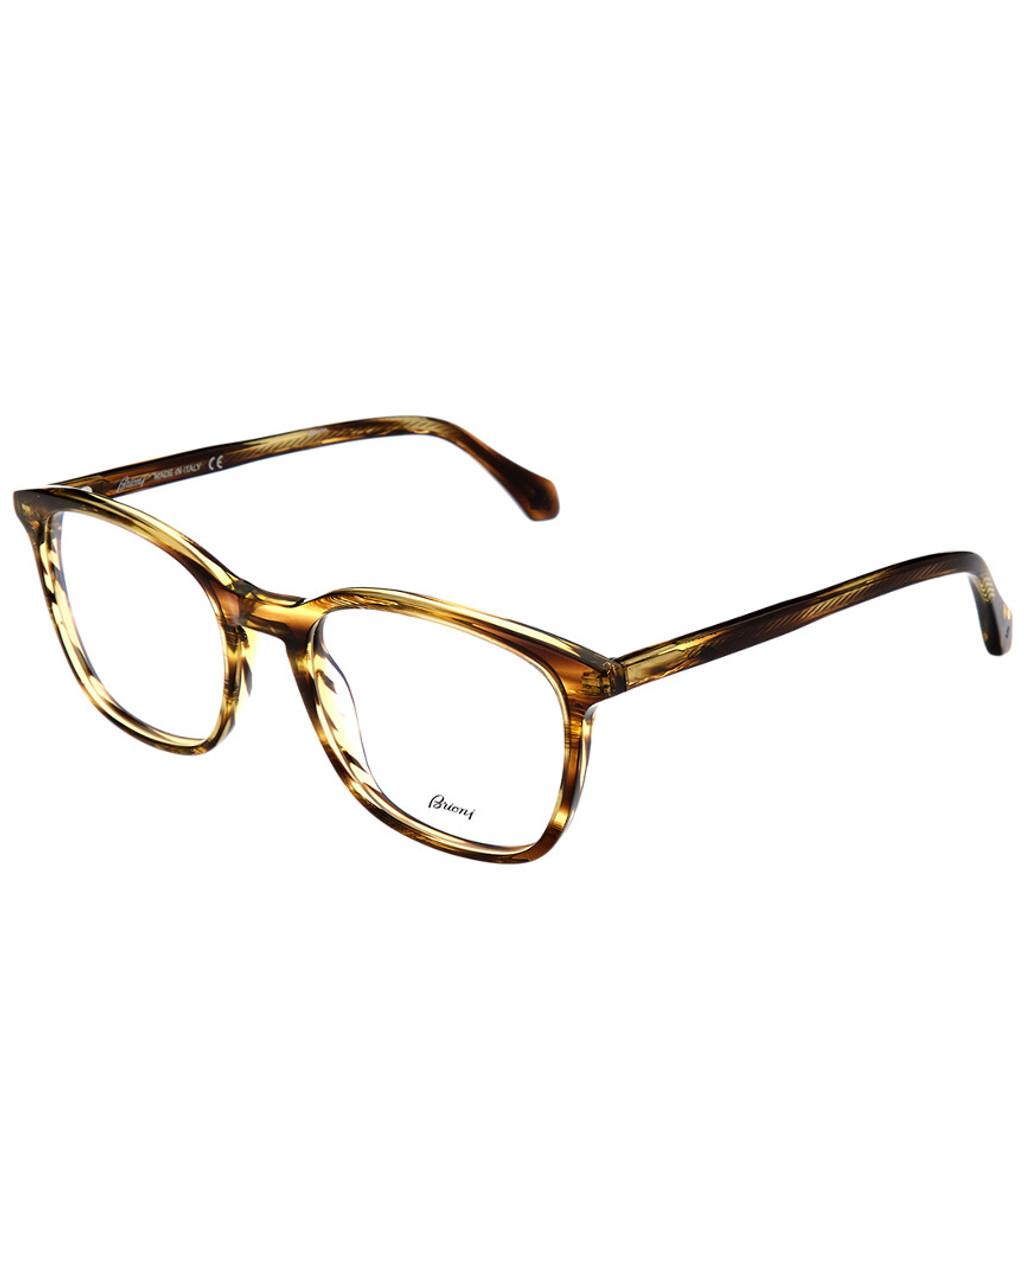 27bdfdfb5c Brioni Men s BR0033O 52mm Optical Frames~1111254108 - Herbergers